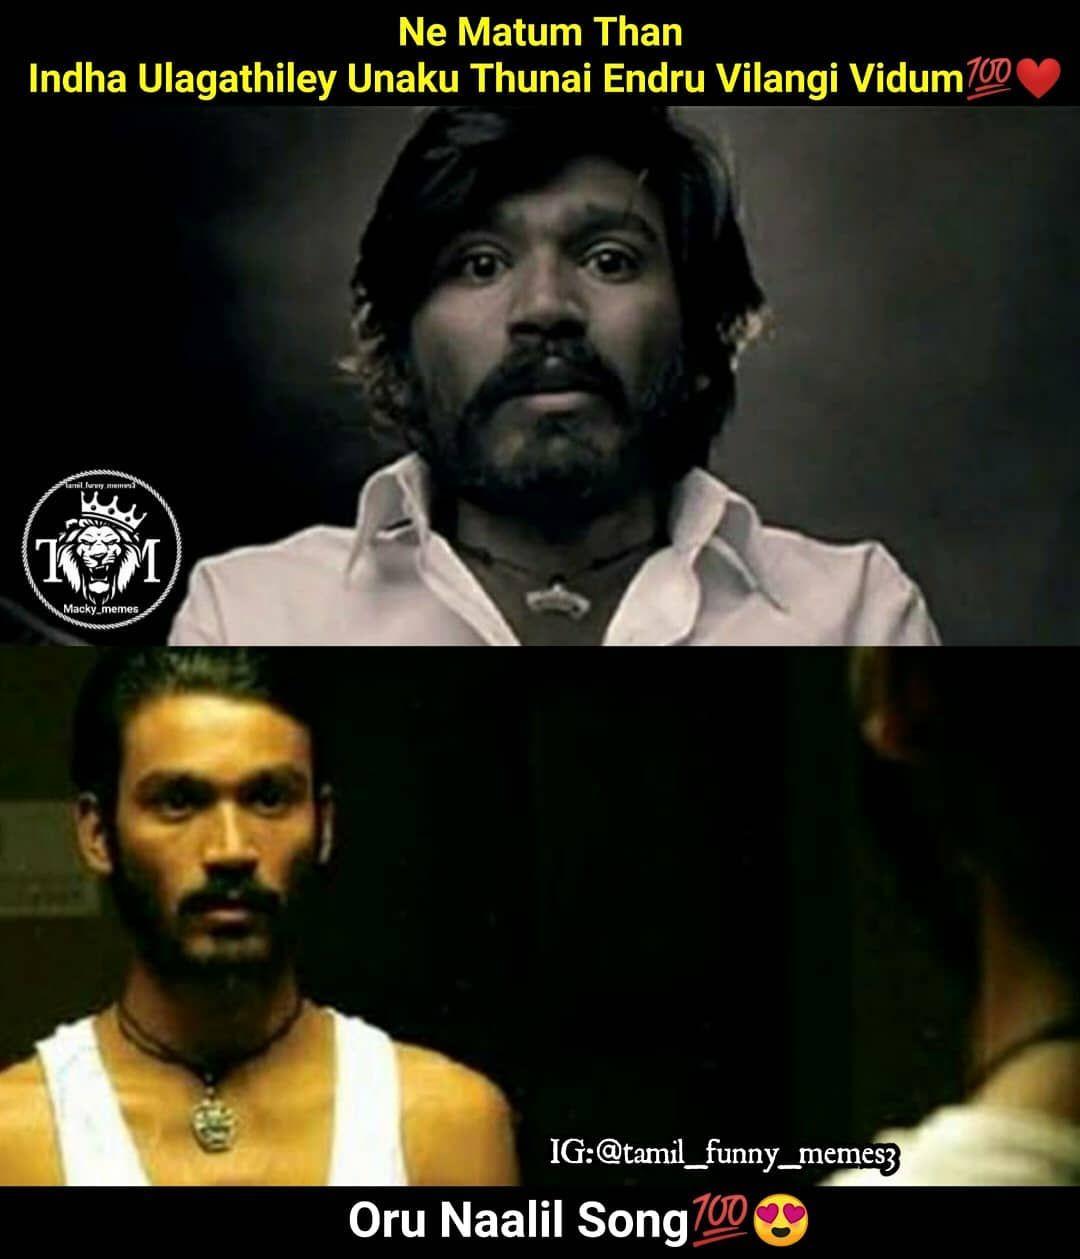 Now Tamil Funny Memes For Instagram Facebook Whatsapp Tarding Tamil Memes 2020 Tamil Funny Memes Very Funny Jokes Tamil Love Memes